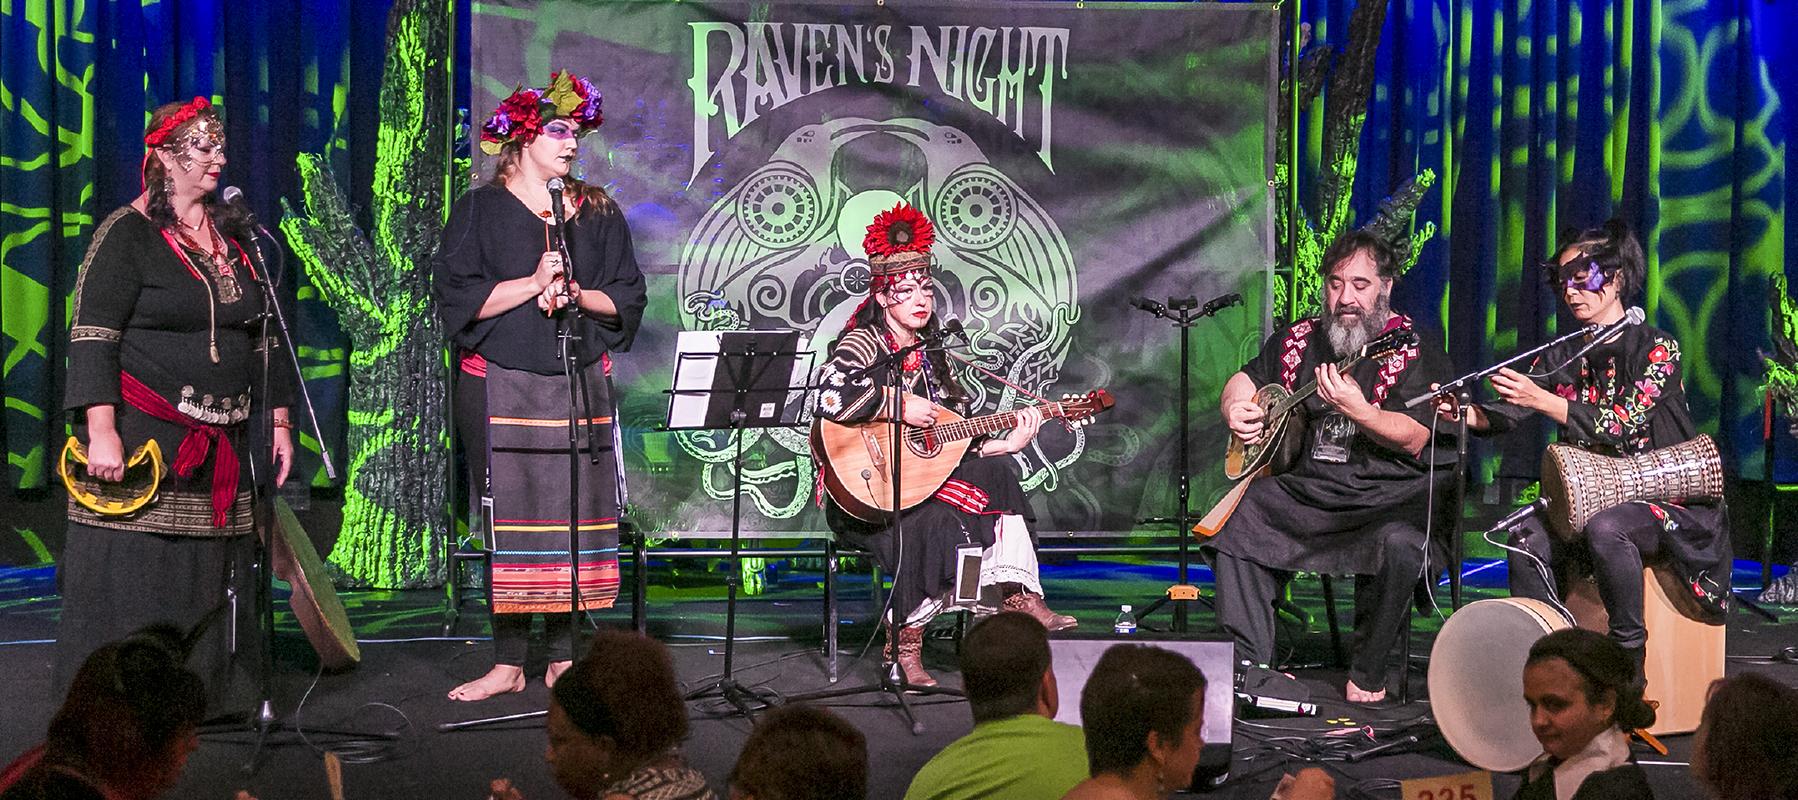 raven's night